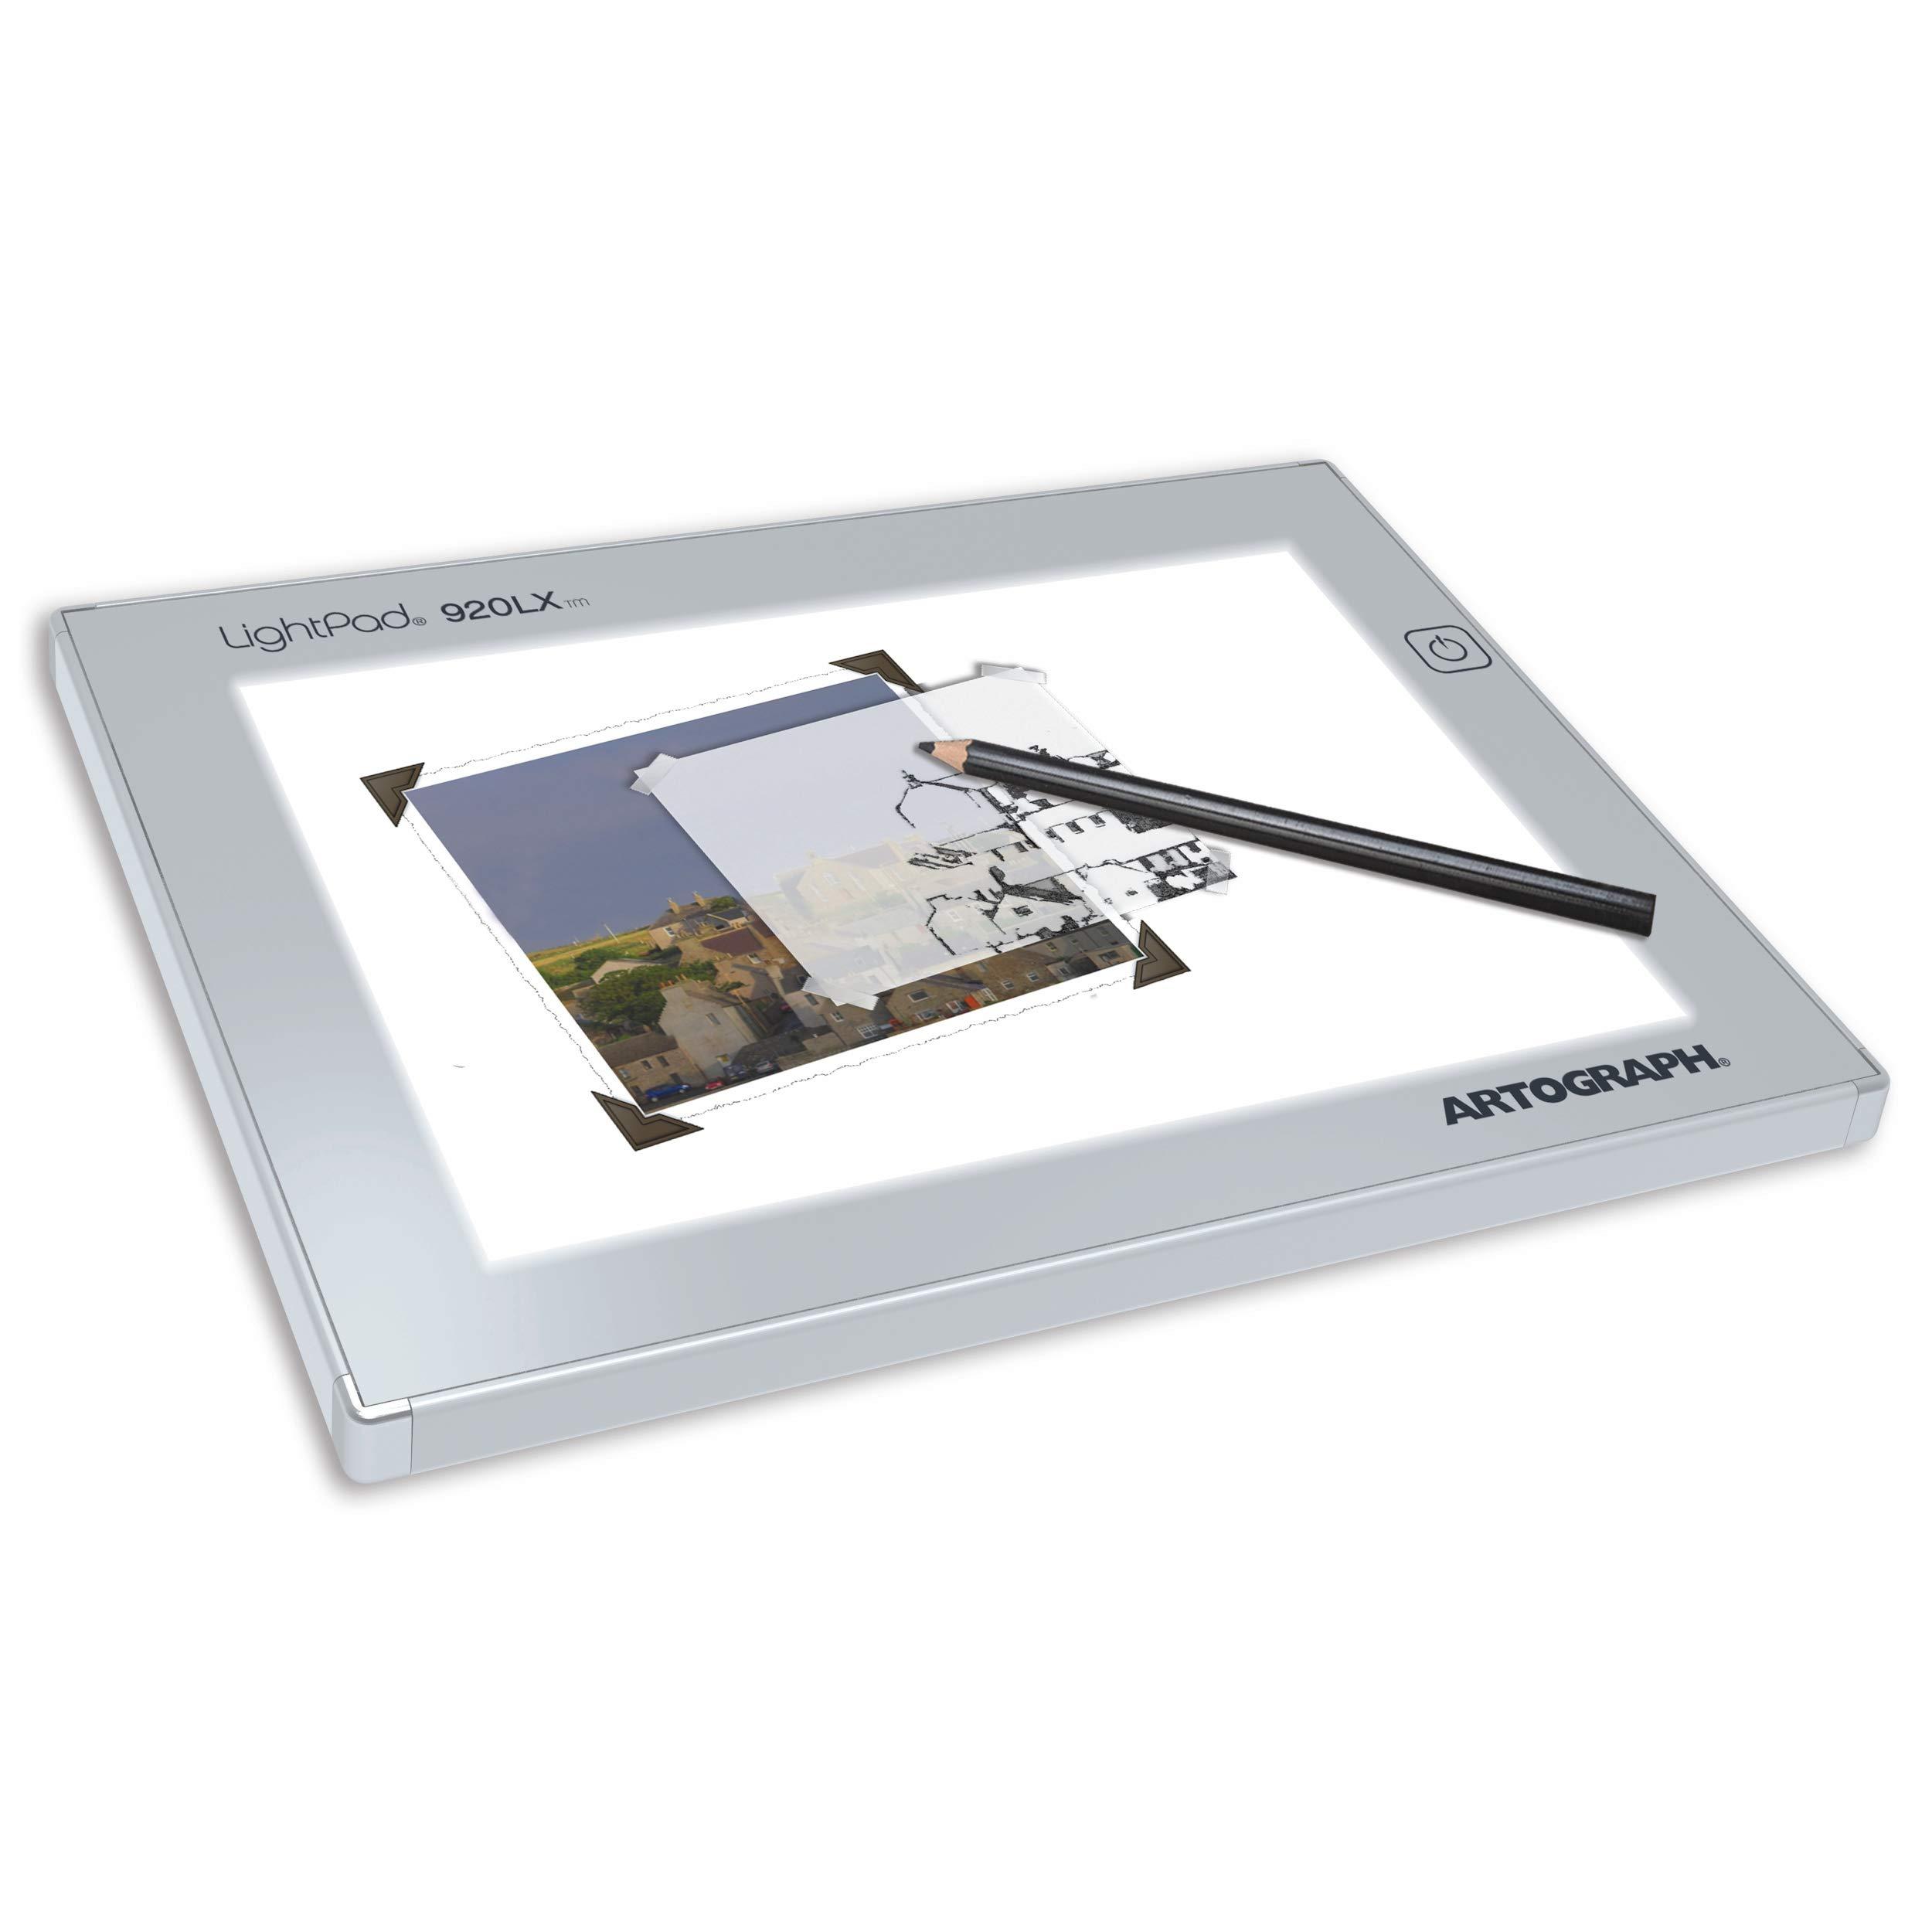 Artograph 920 LX LightPad light box, 6 X 9, White by Artograph